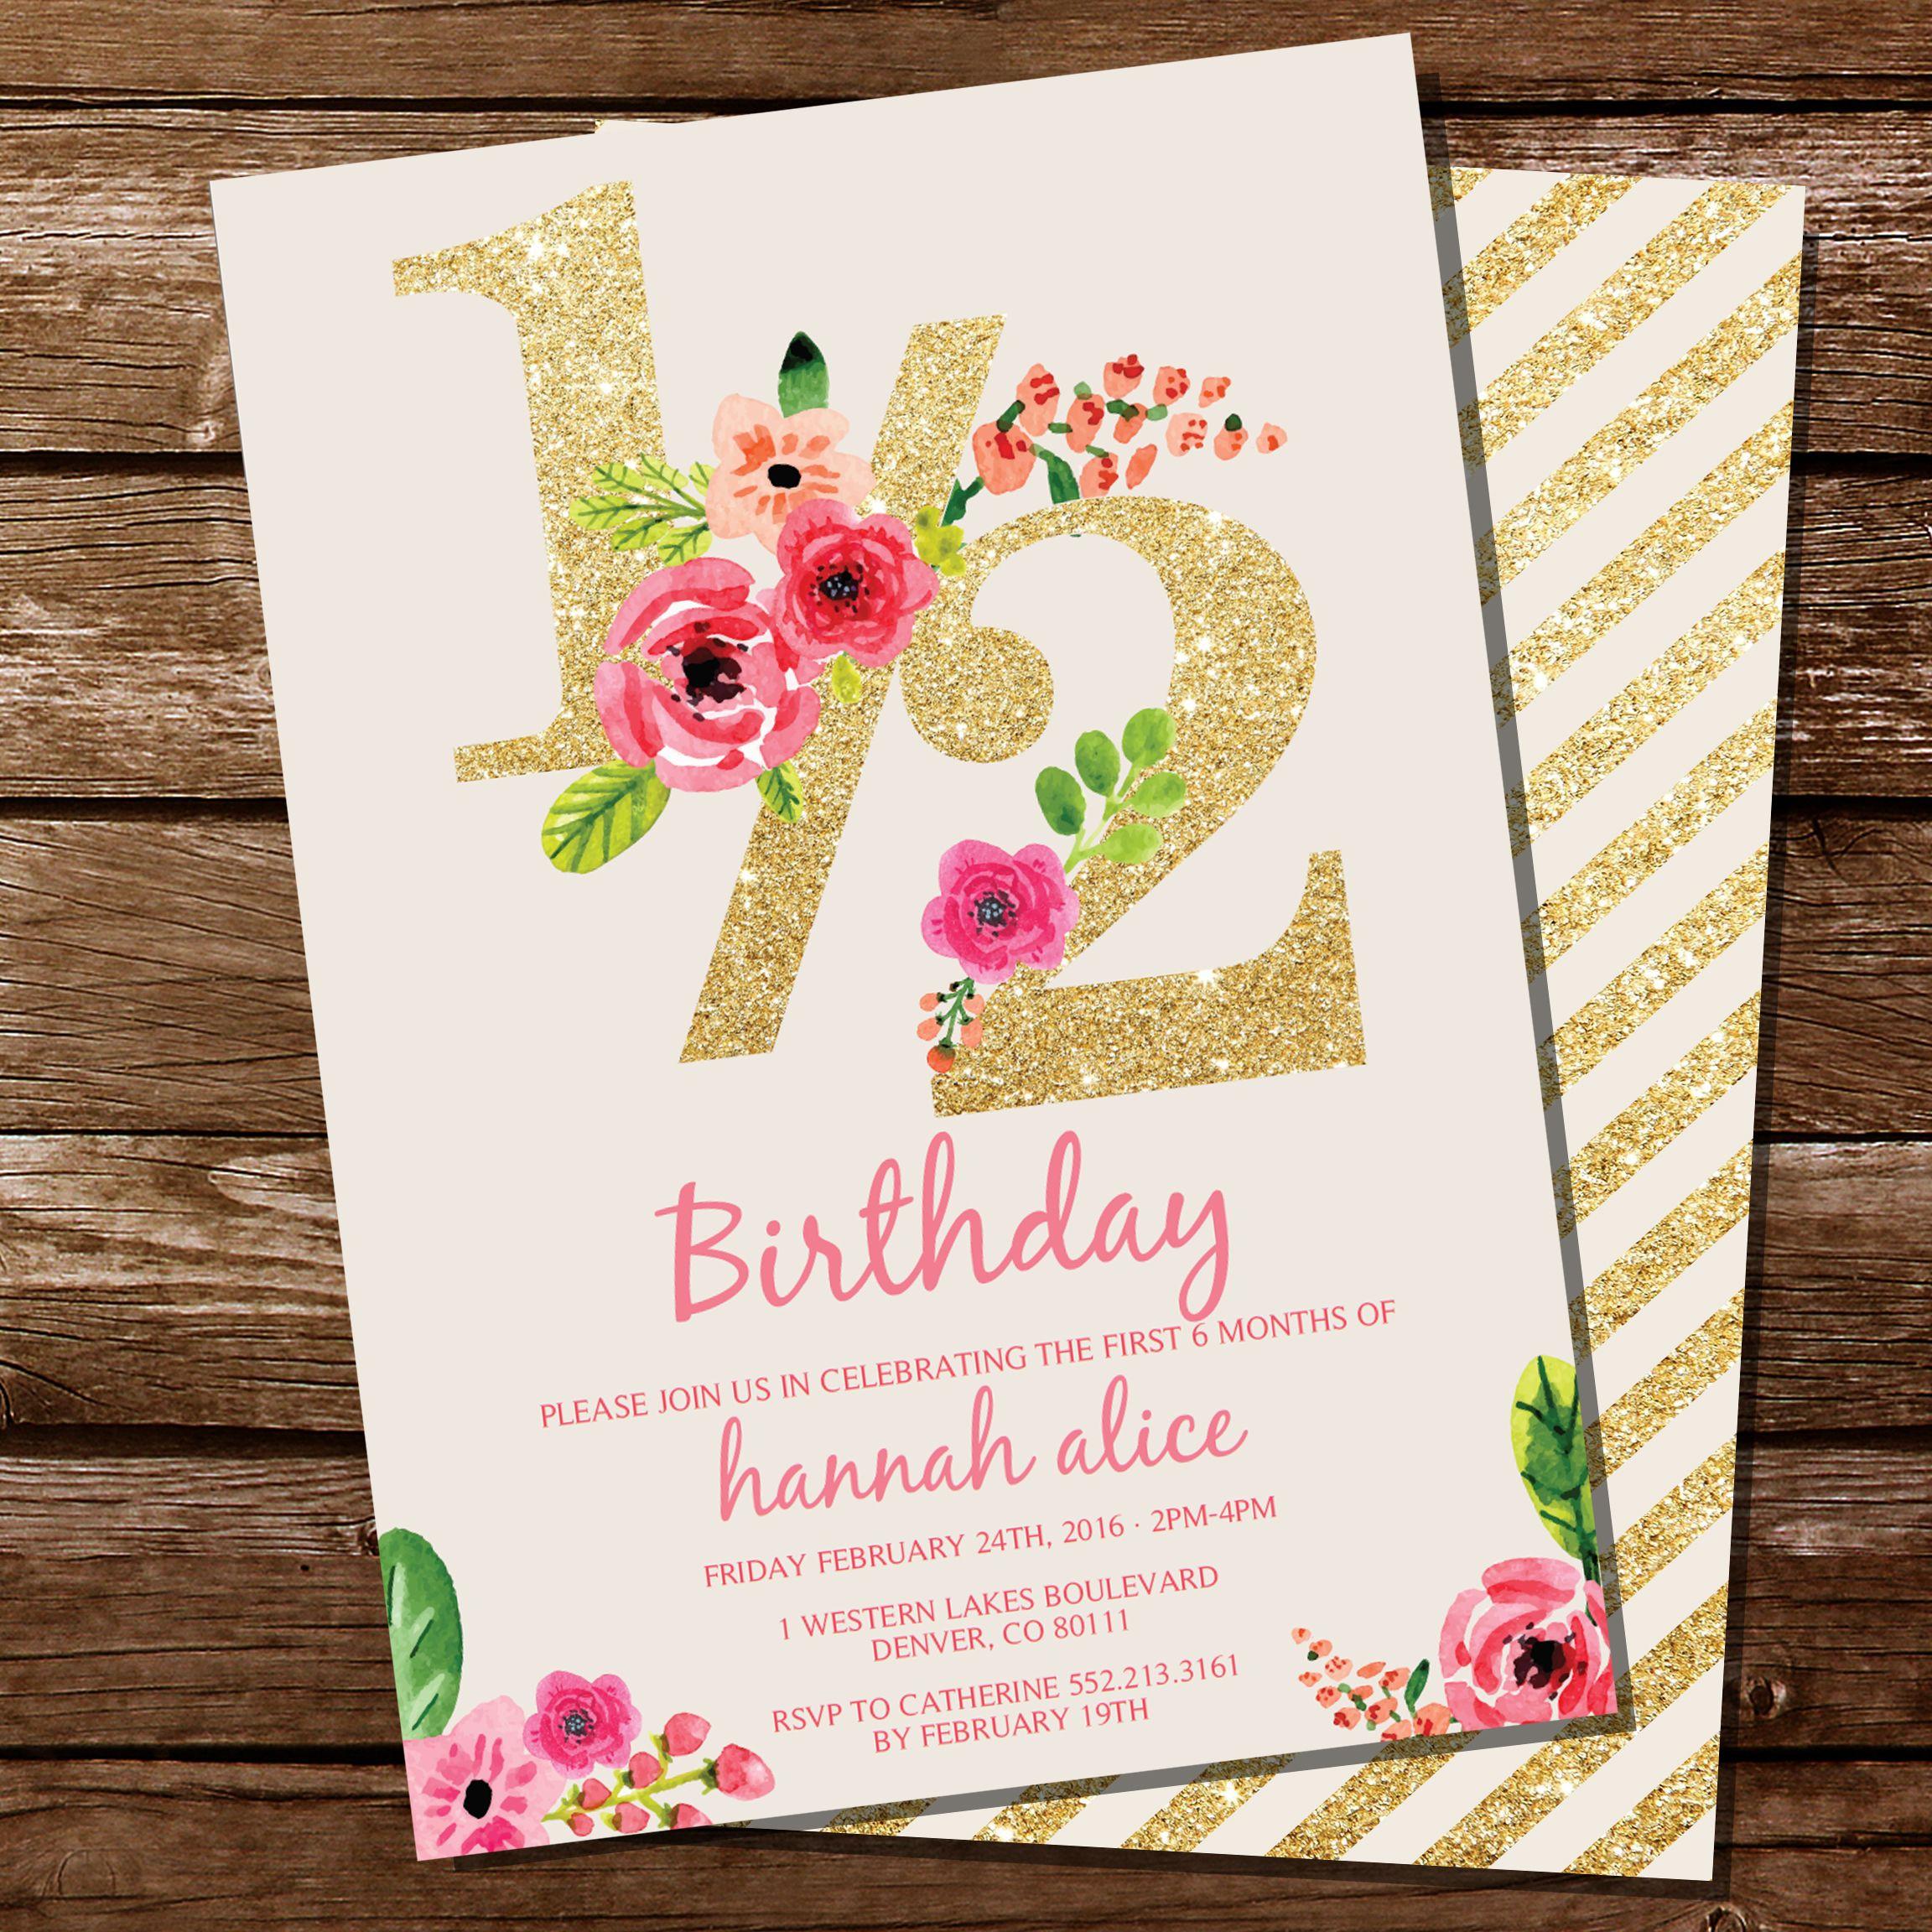 Half birthday invitation with gold glitter and pink florals half birthday invitation with gold glitter and pink florals halfbirthday pinkandgoldparty filmwisefo